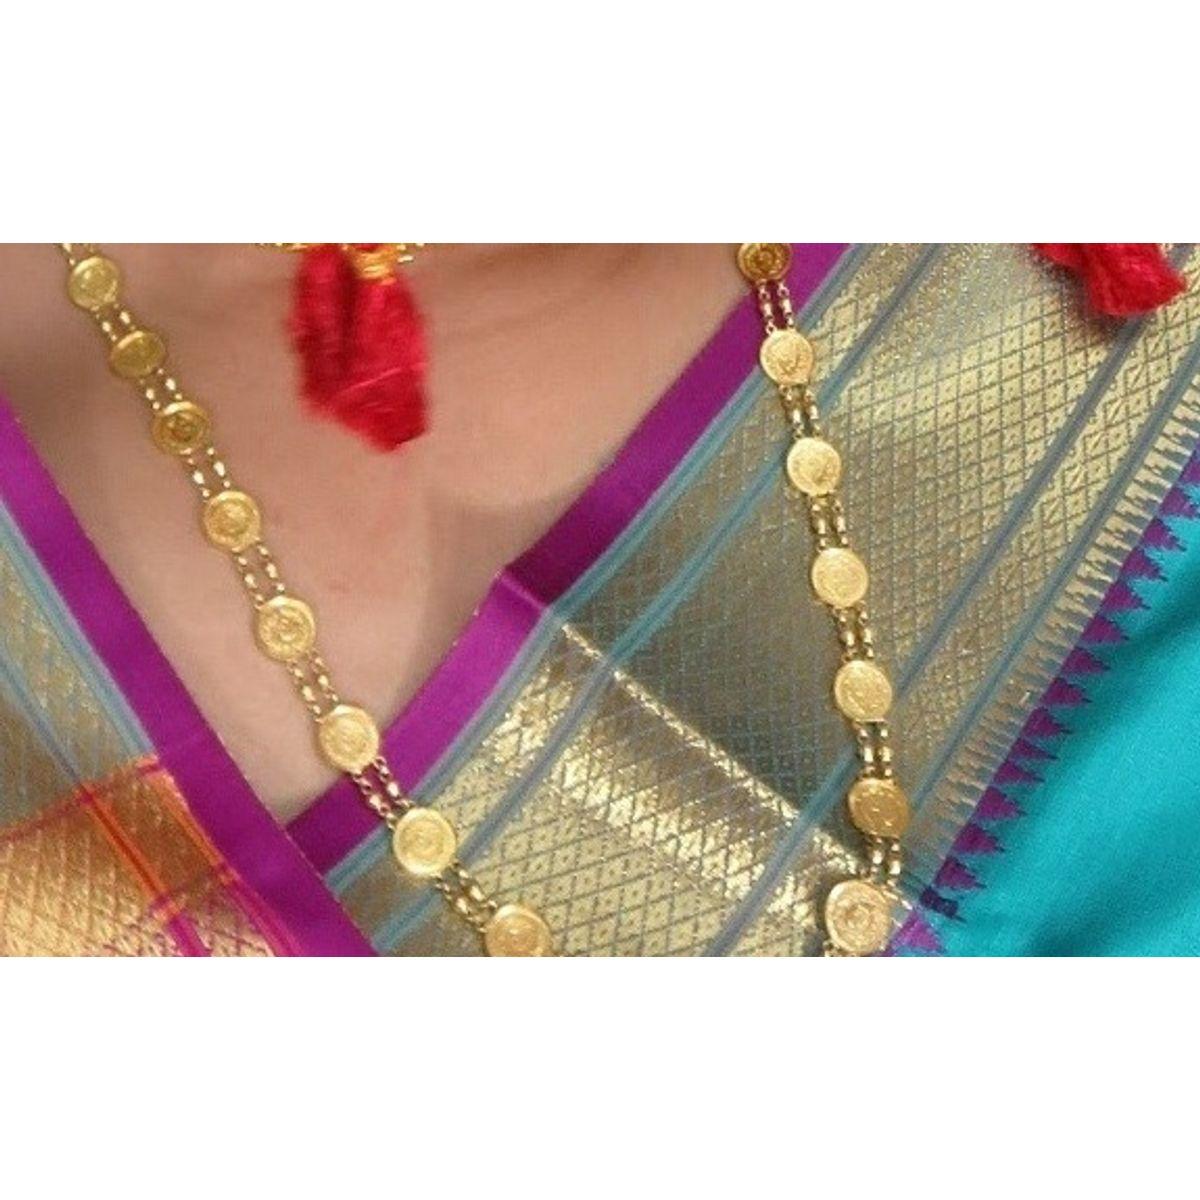 Charming Maharashtrian Gold Necklace Designs Photos - Jewelry ...